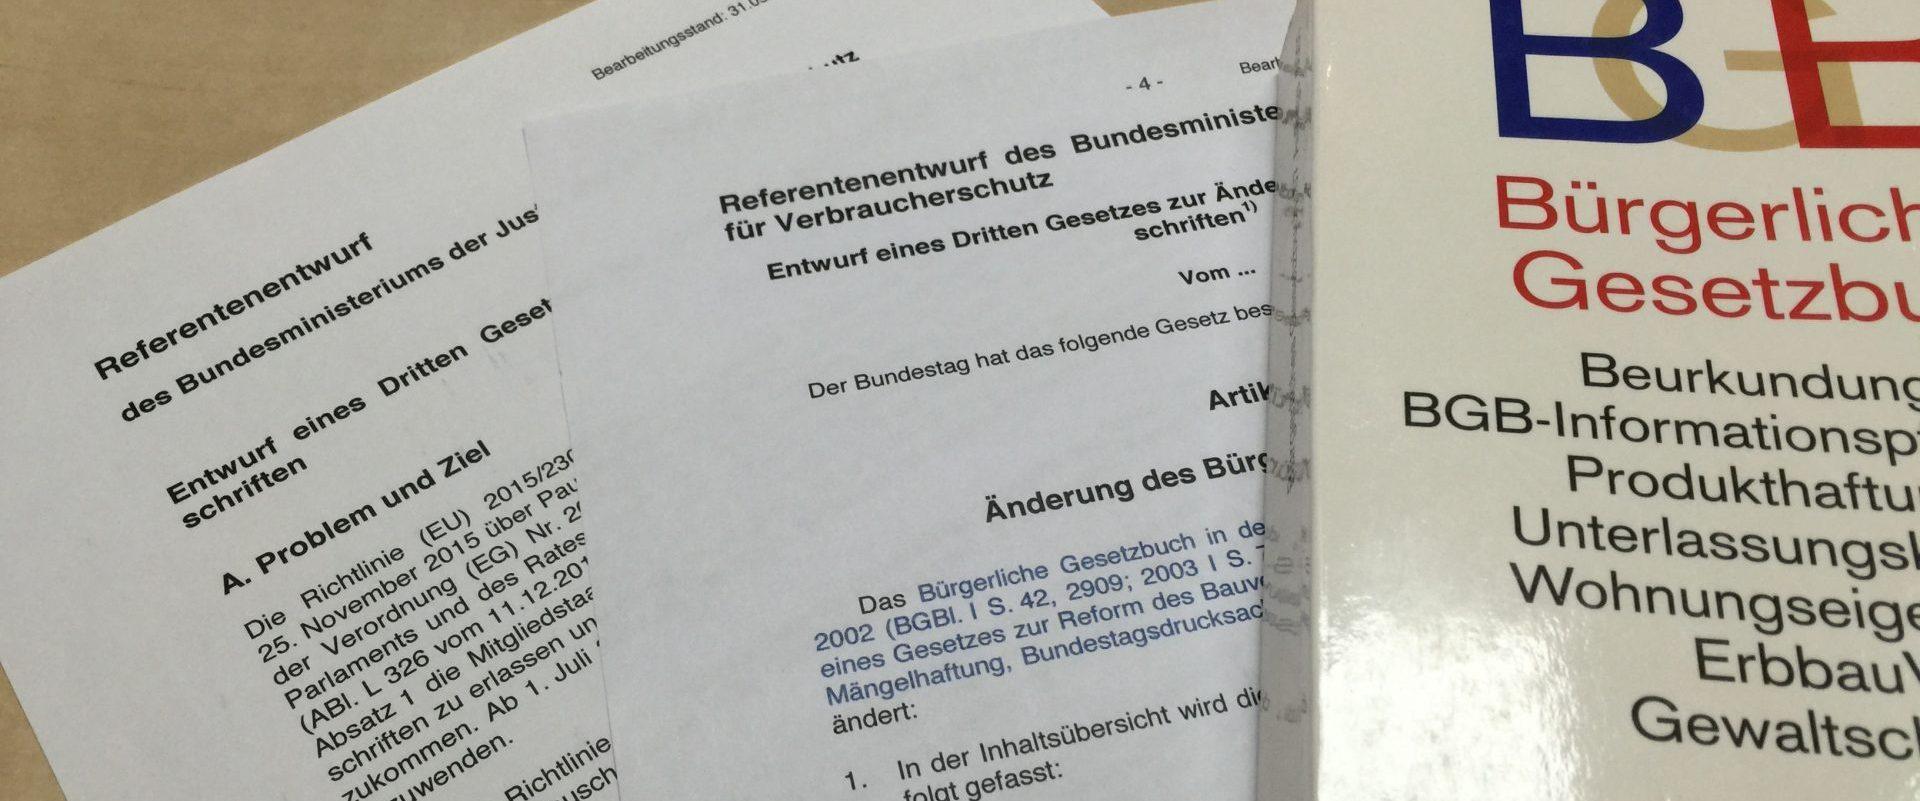 Aktionen Archive - Verband unabhängiger selbstständiger Reisebüros e.V.